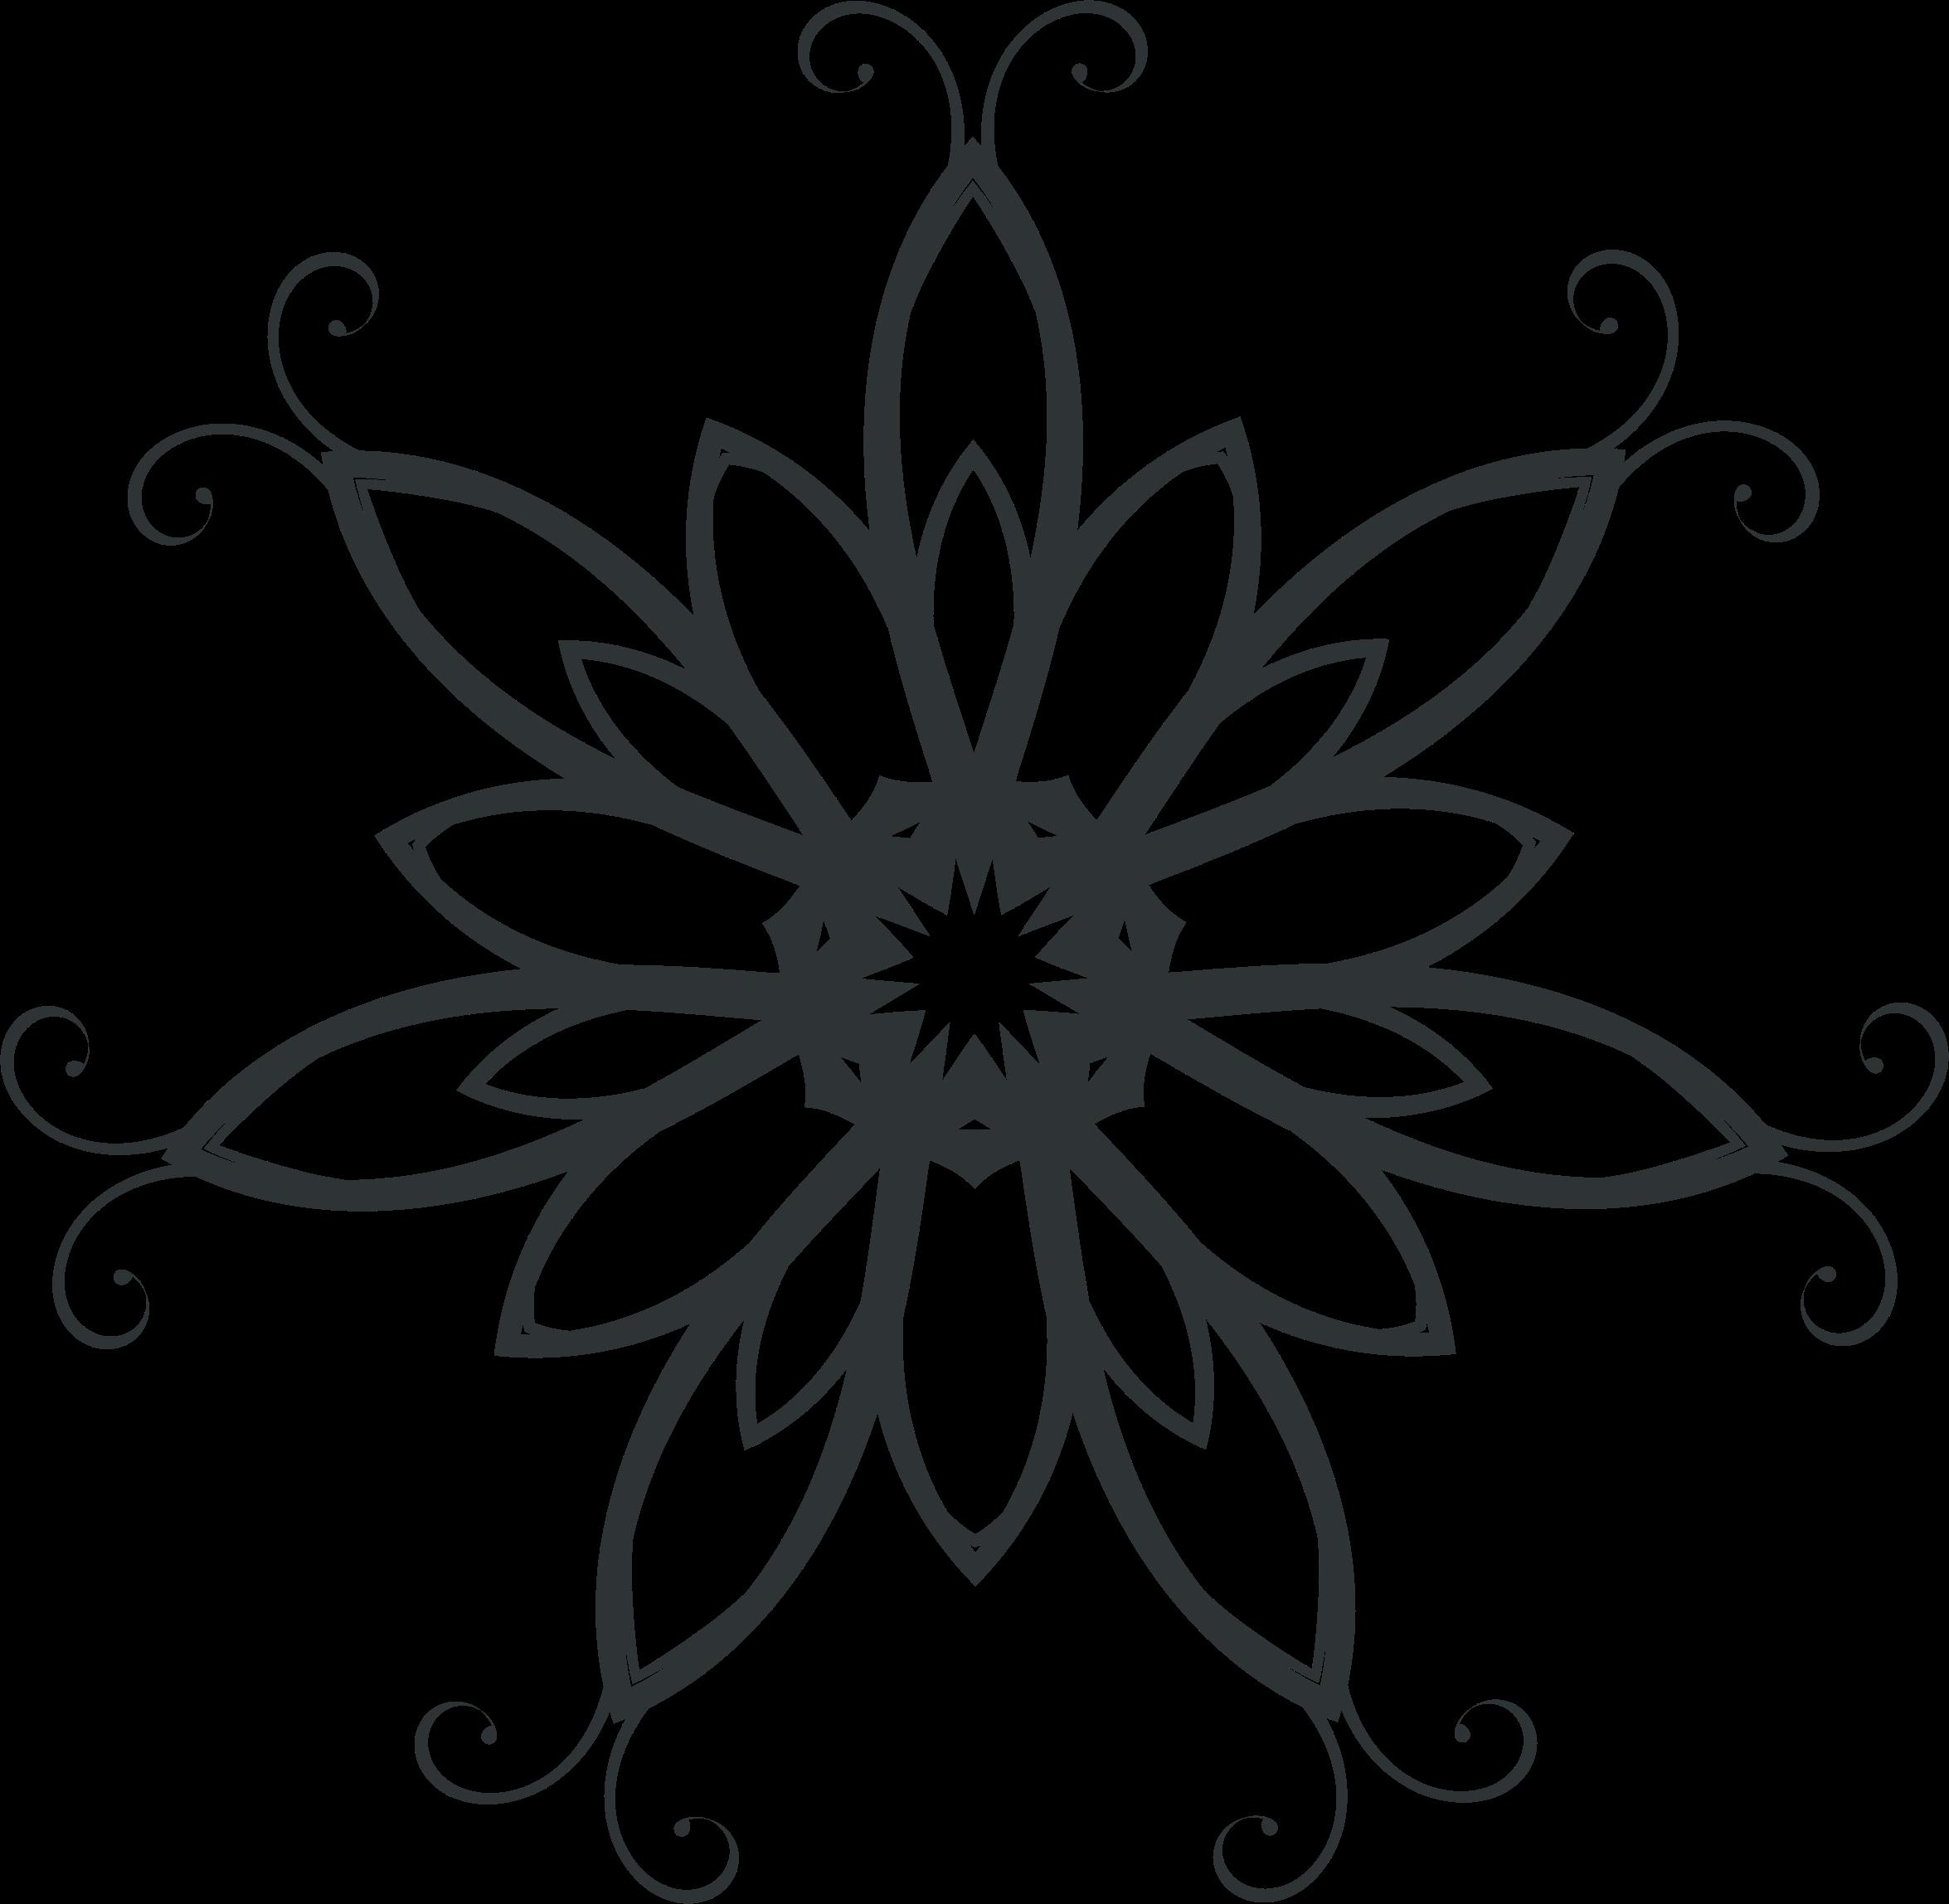 Black and white clipart flourish with sun clip art library library Clipart - Silhouette Flourish Design 3 clip art library library